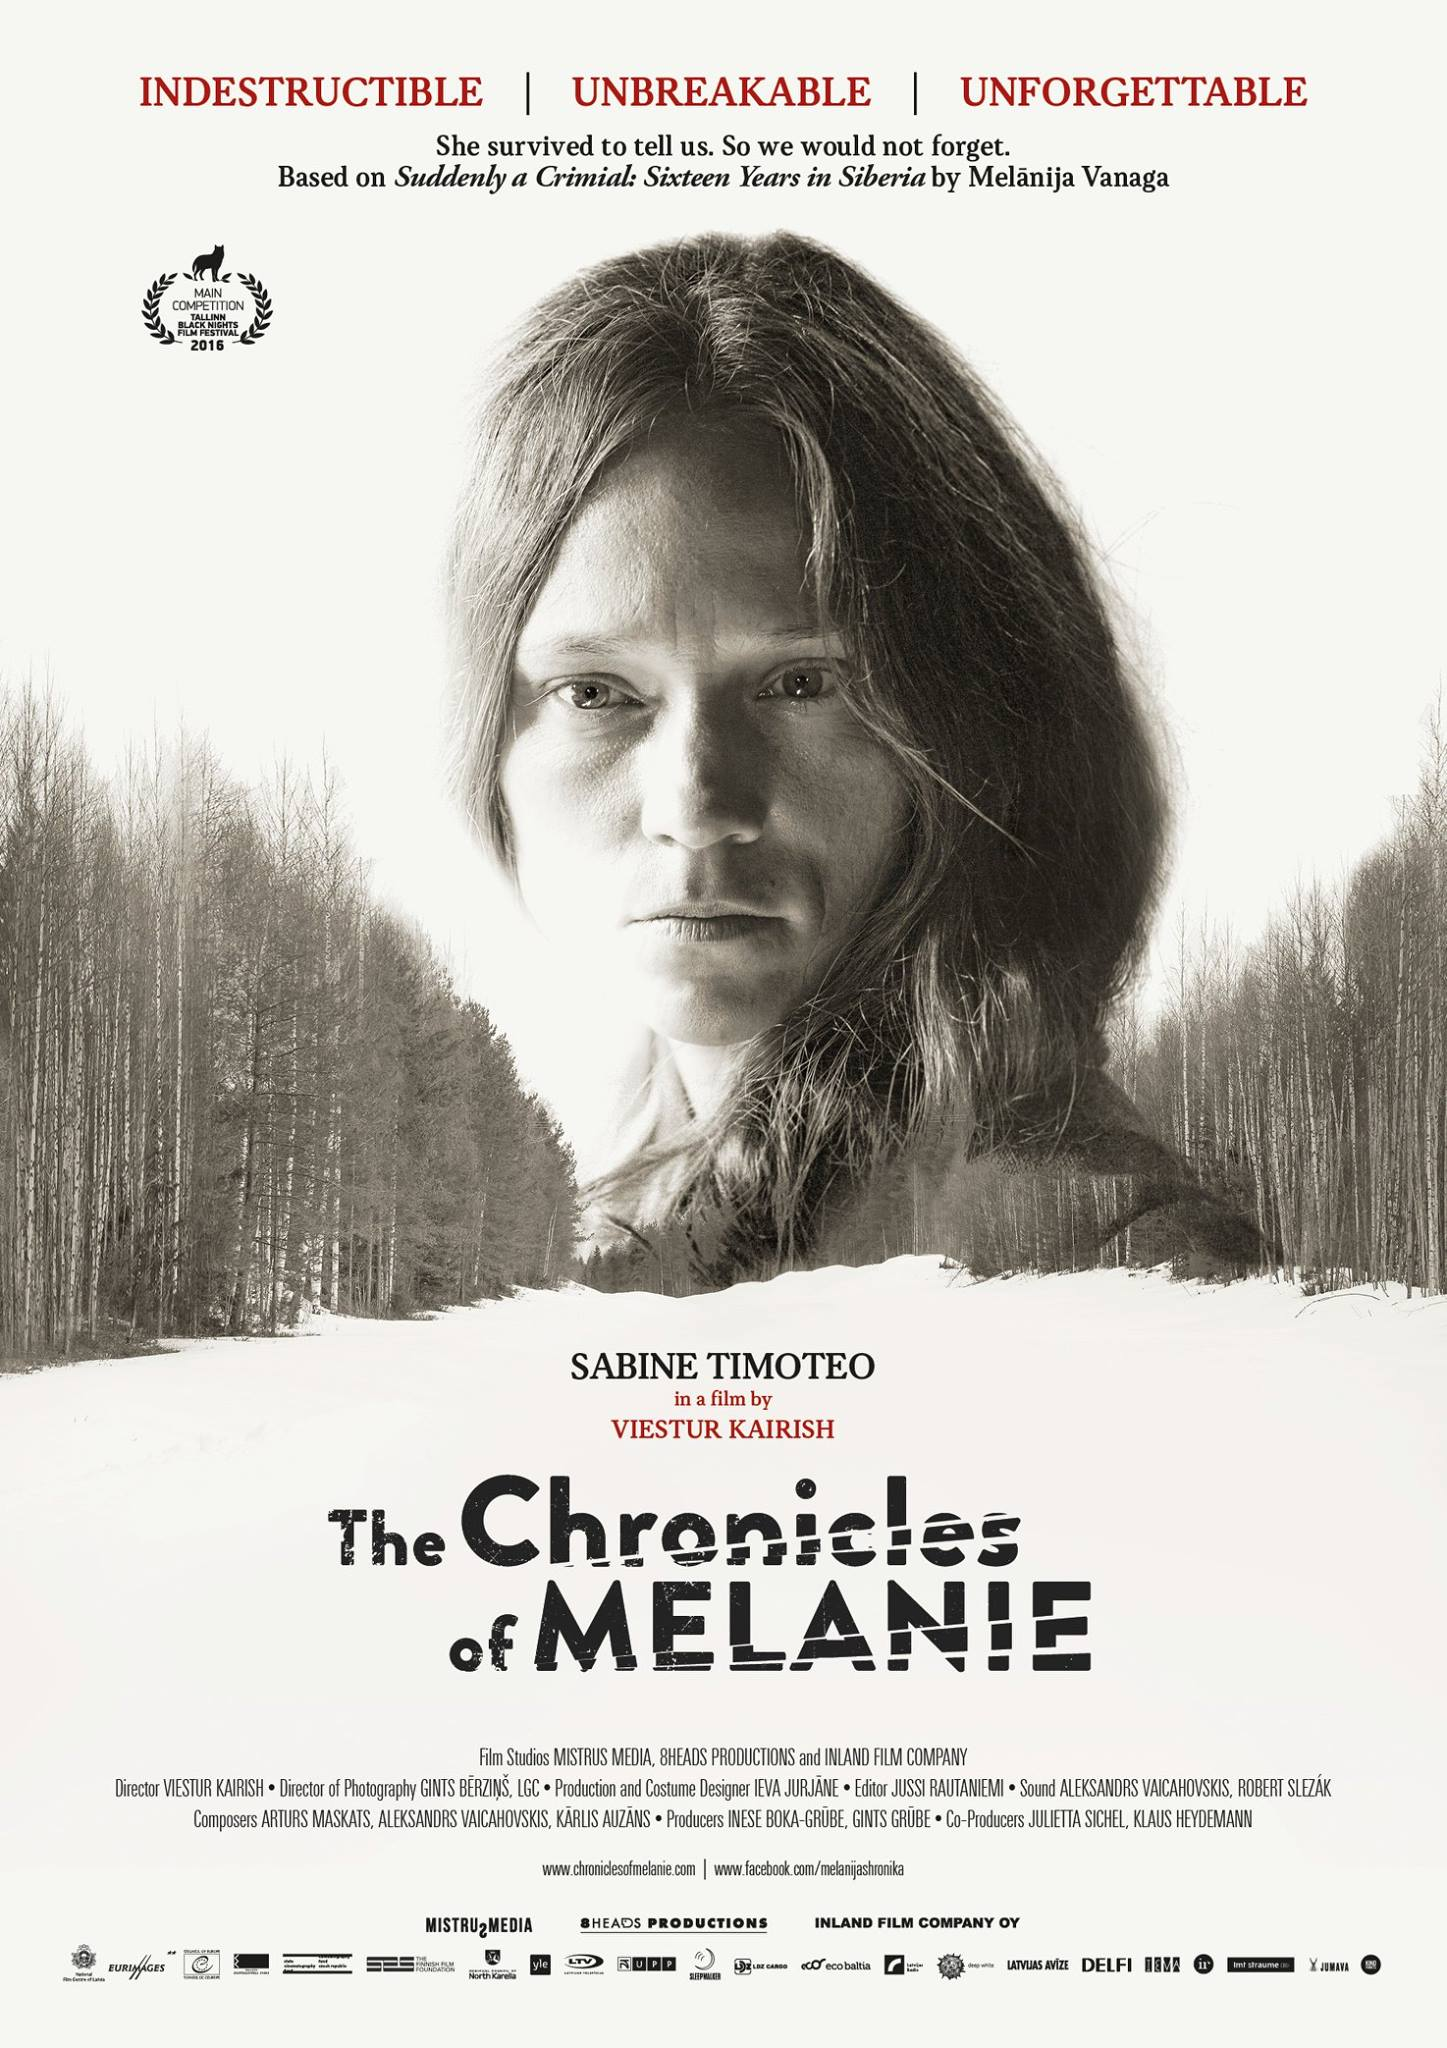 Chronicles of Melanie  dir. Viesturs Kairiss Mistrus media, Inland Film Company / 2016